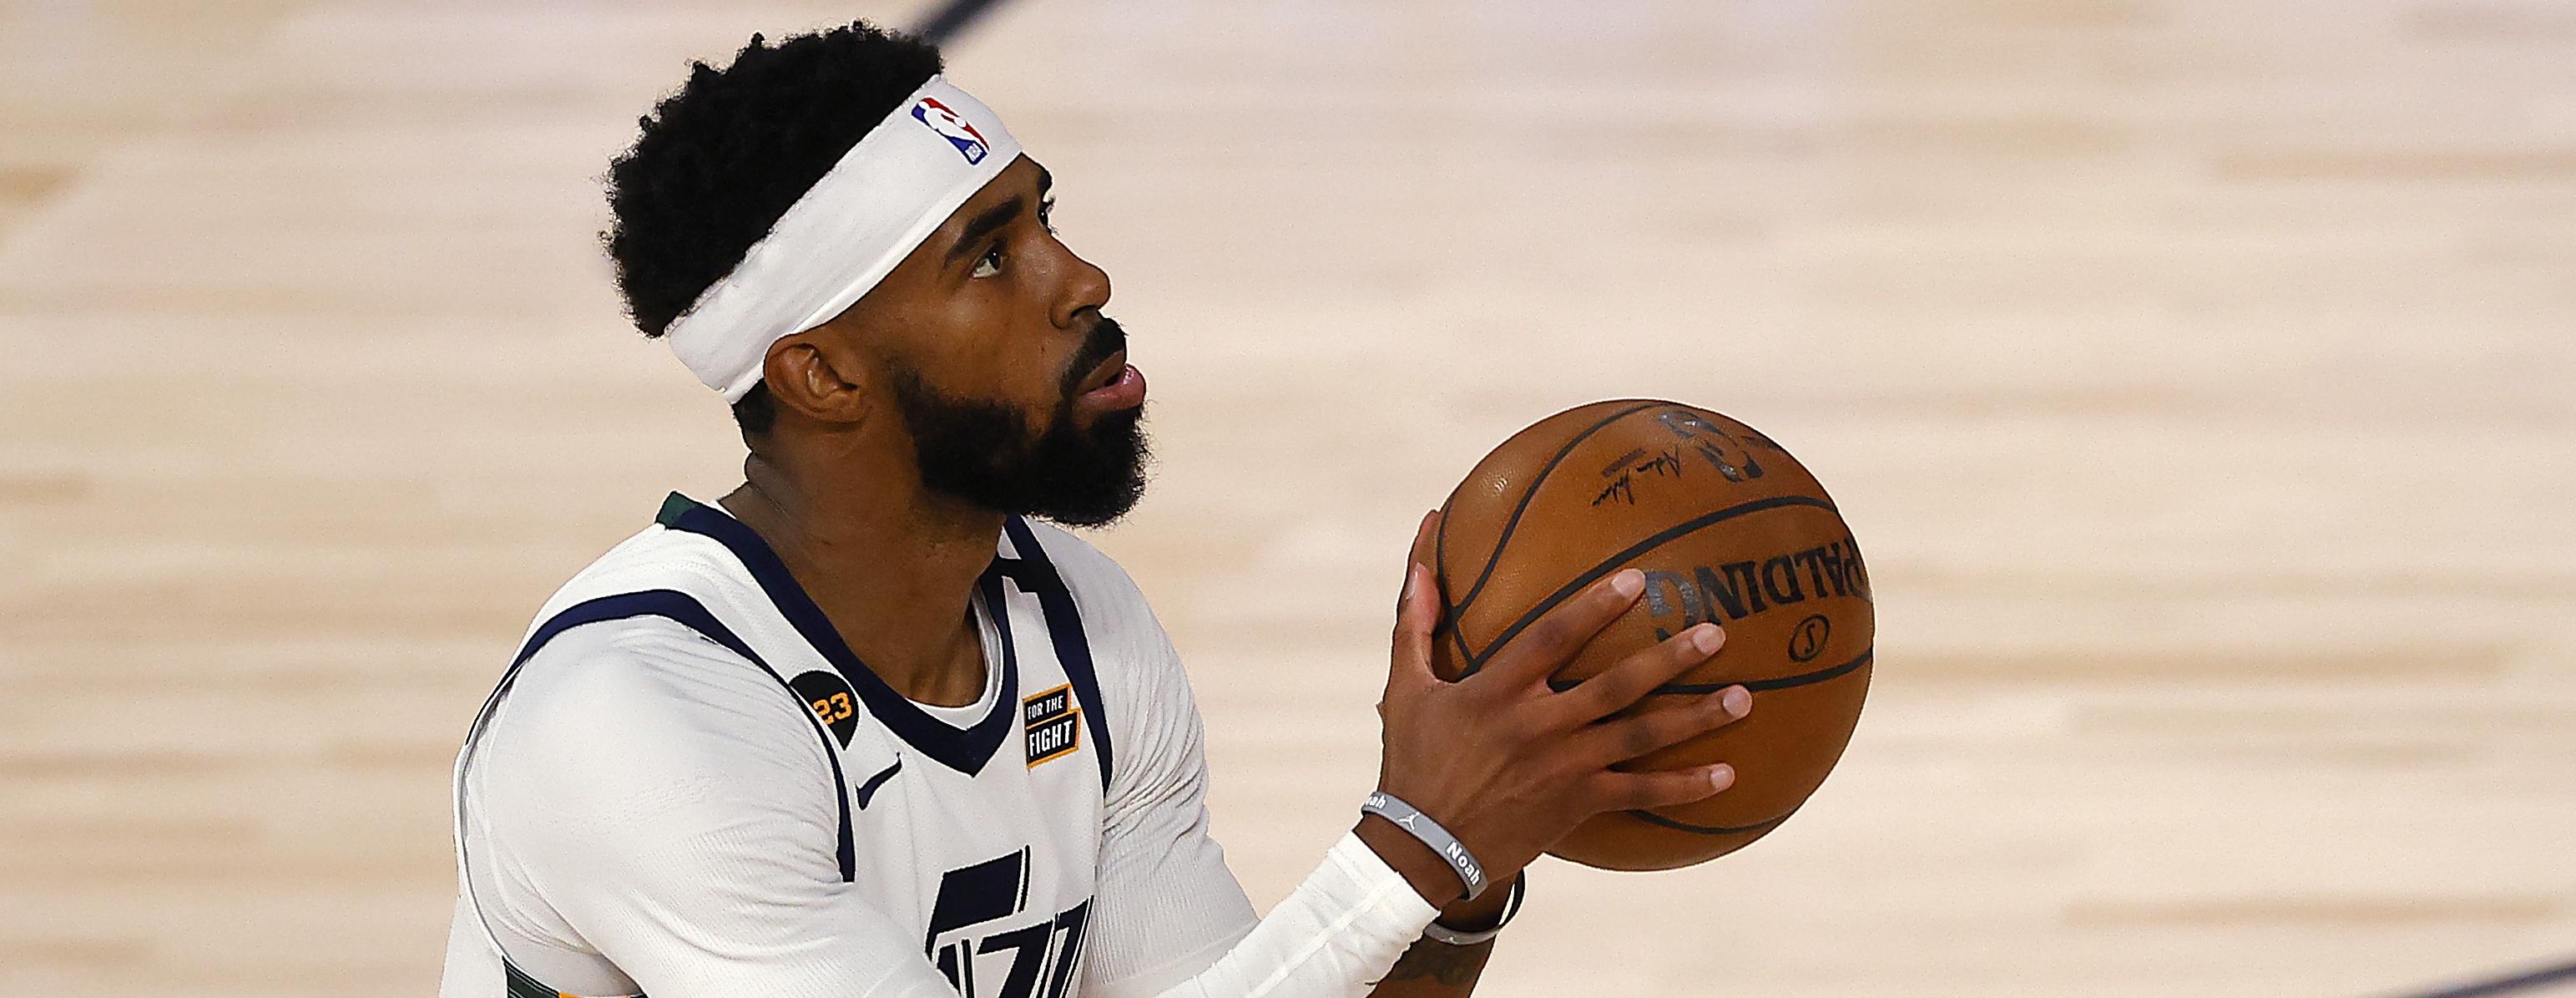 Jazz vs Nuggets Pick - Game 6 2020 NBA Playoffs